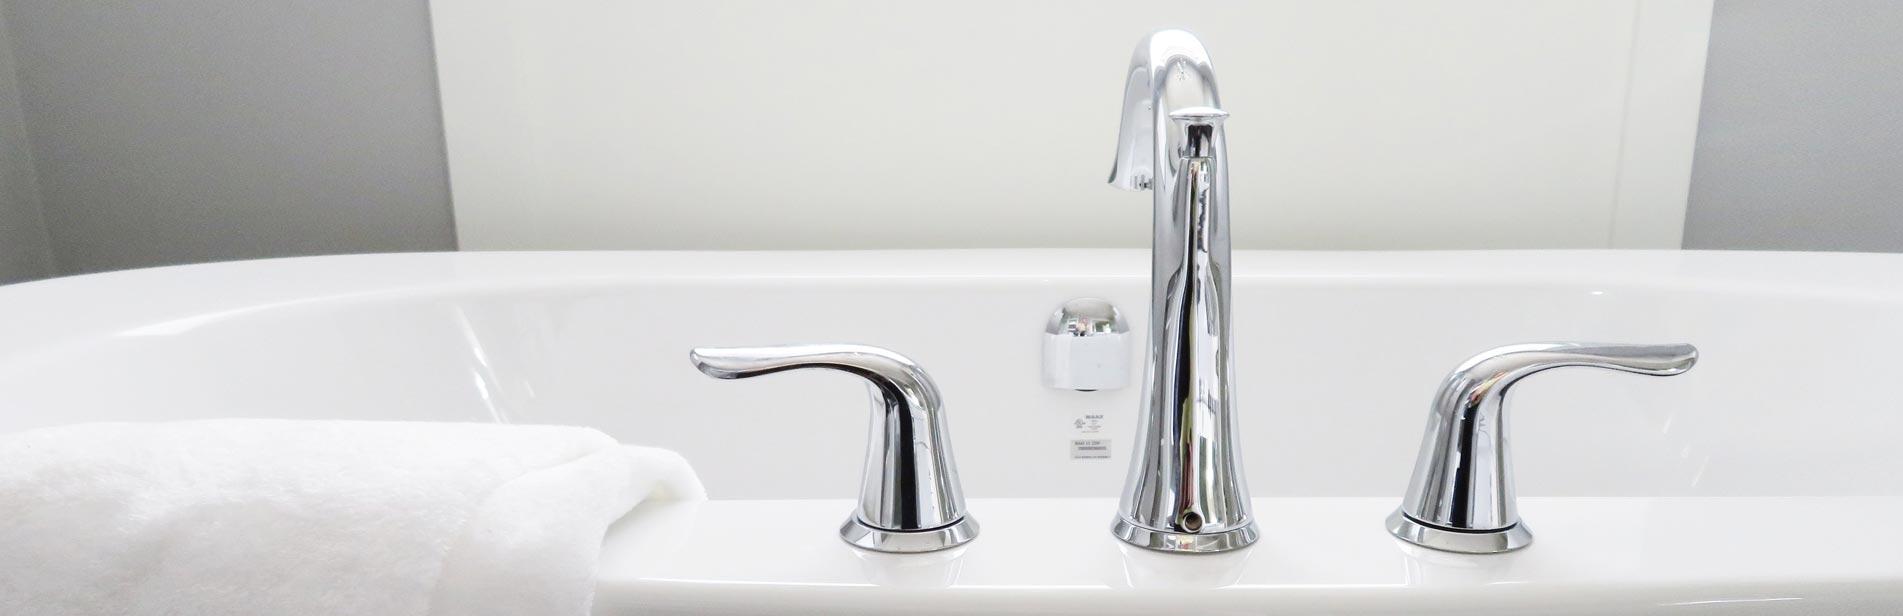 classic-bathroom-renovation1, Kitchen Renovation, Bathroom Renovation, House Renovation Auckland